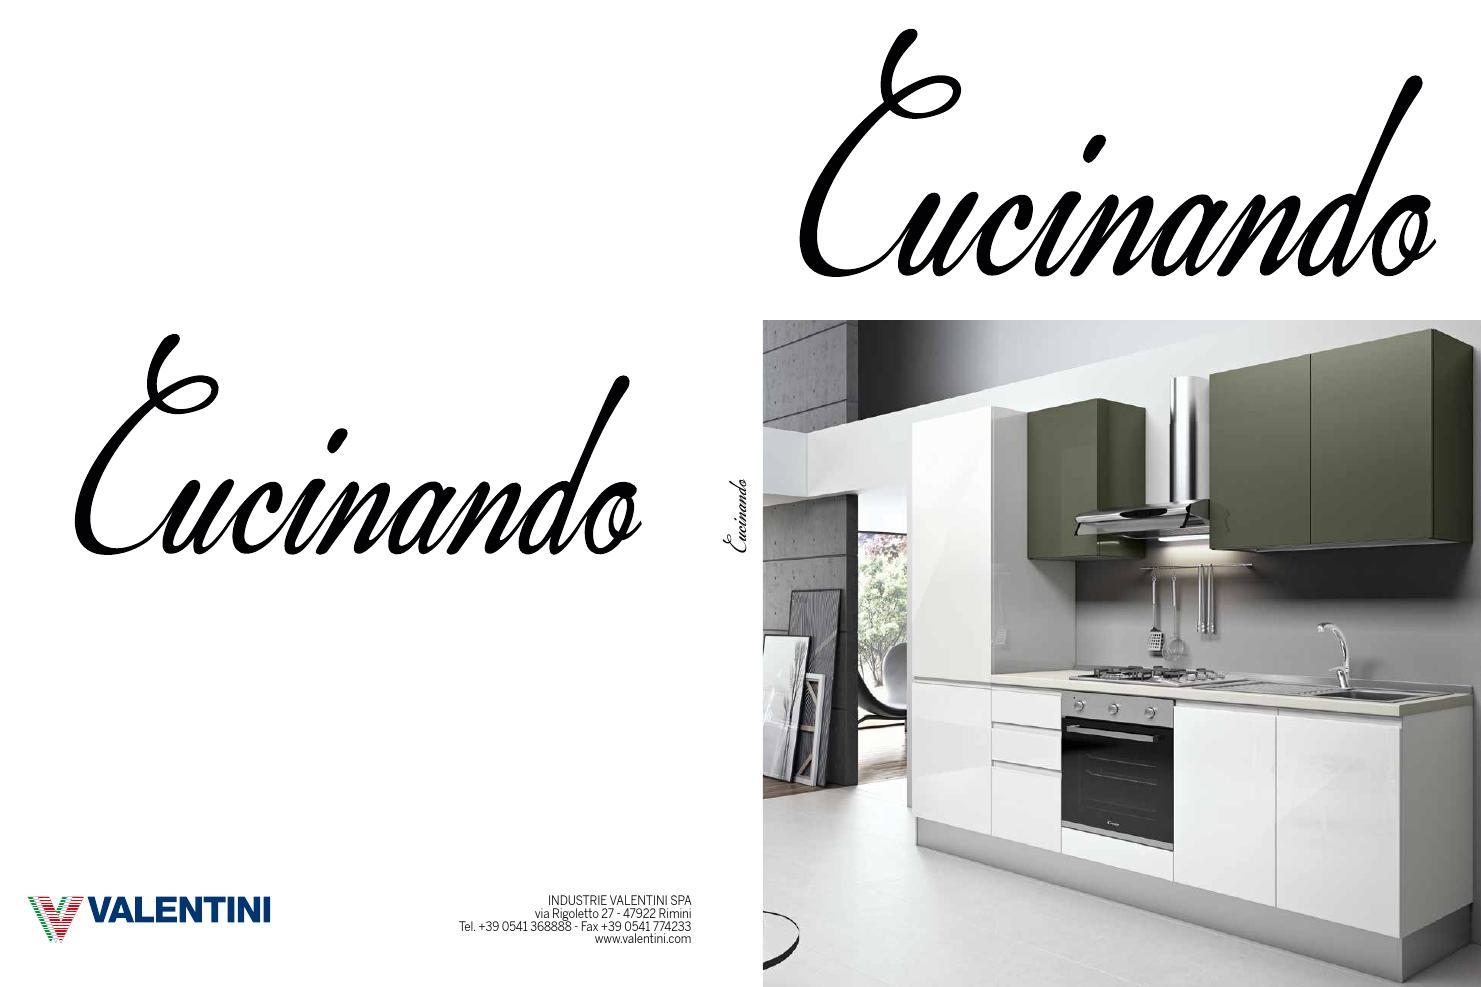 catalogo cucinando by industrie valentini s.p.a. - issuu - Cucine Valentini